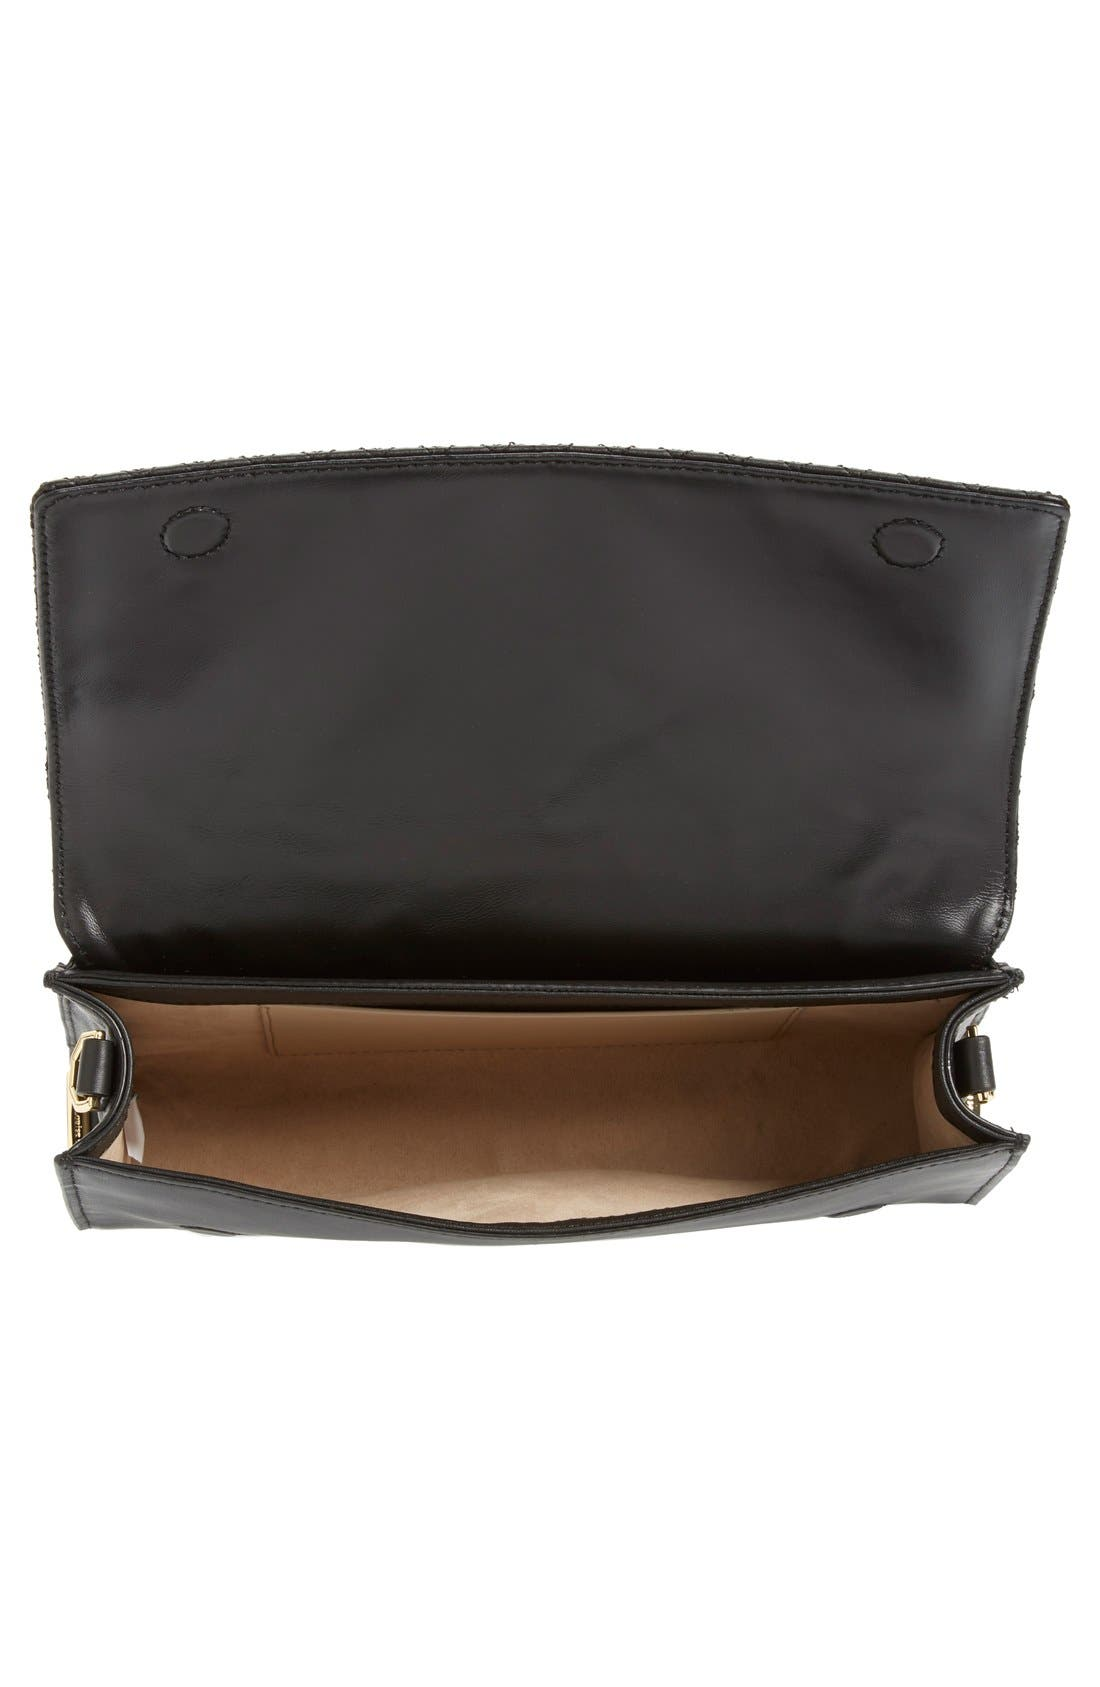 'Yvet' Leather Flap Clutch,                             Alternate thumbnail 8, color,